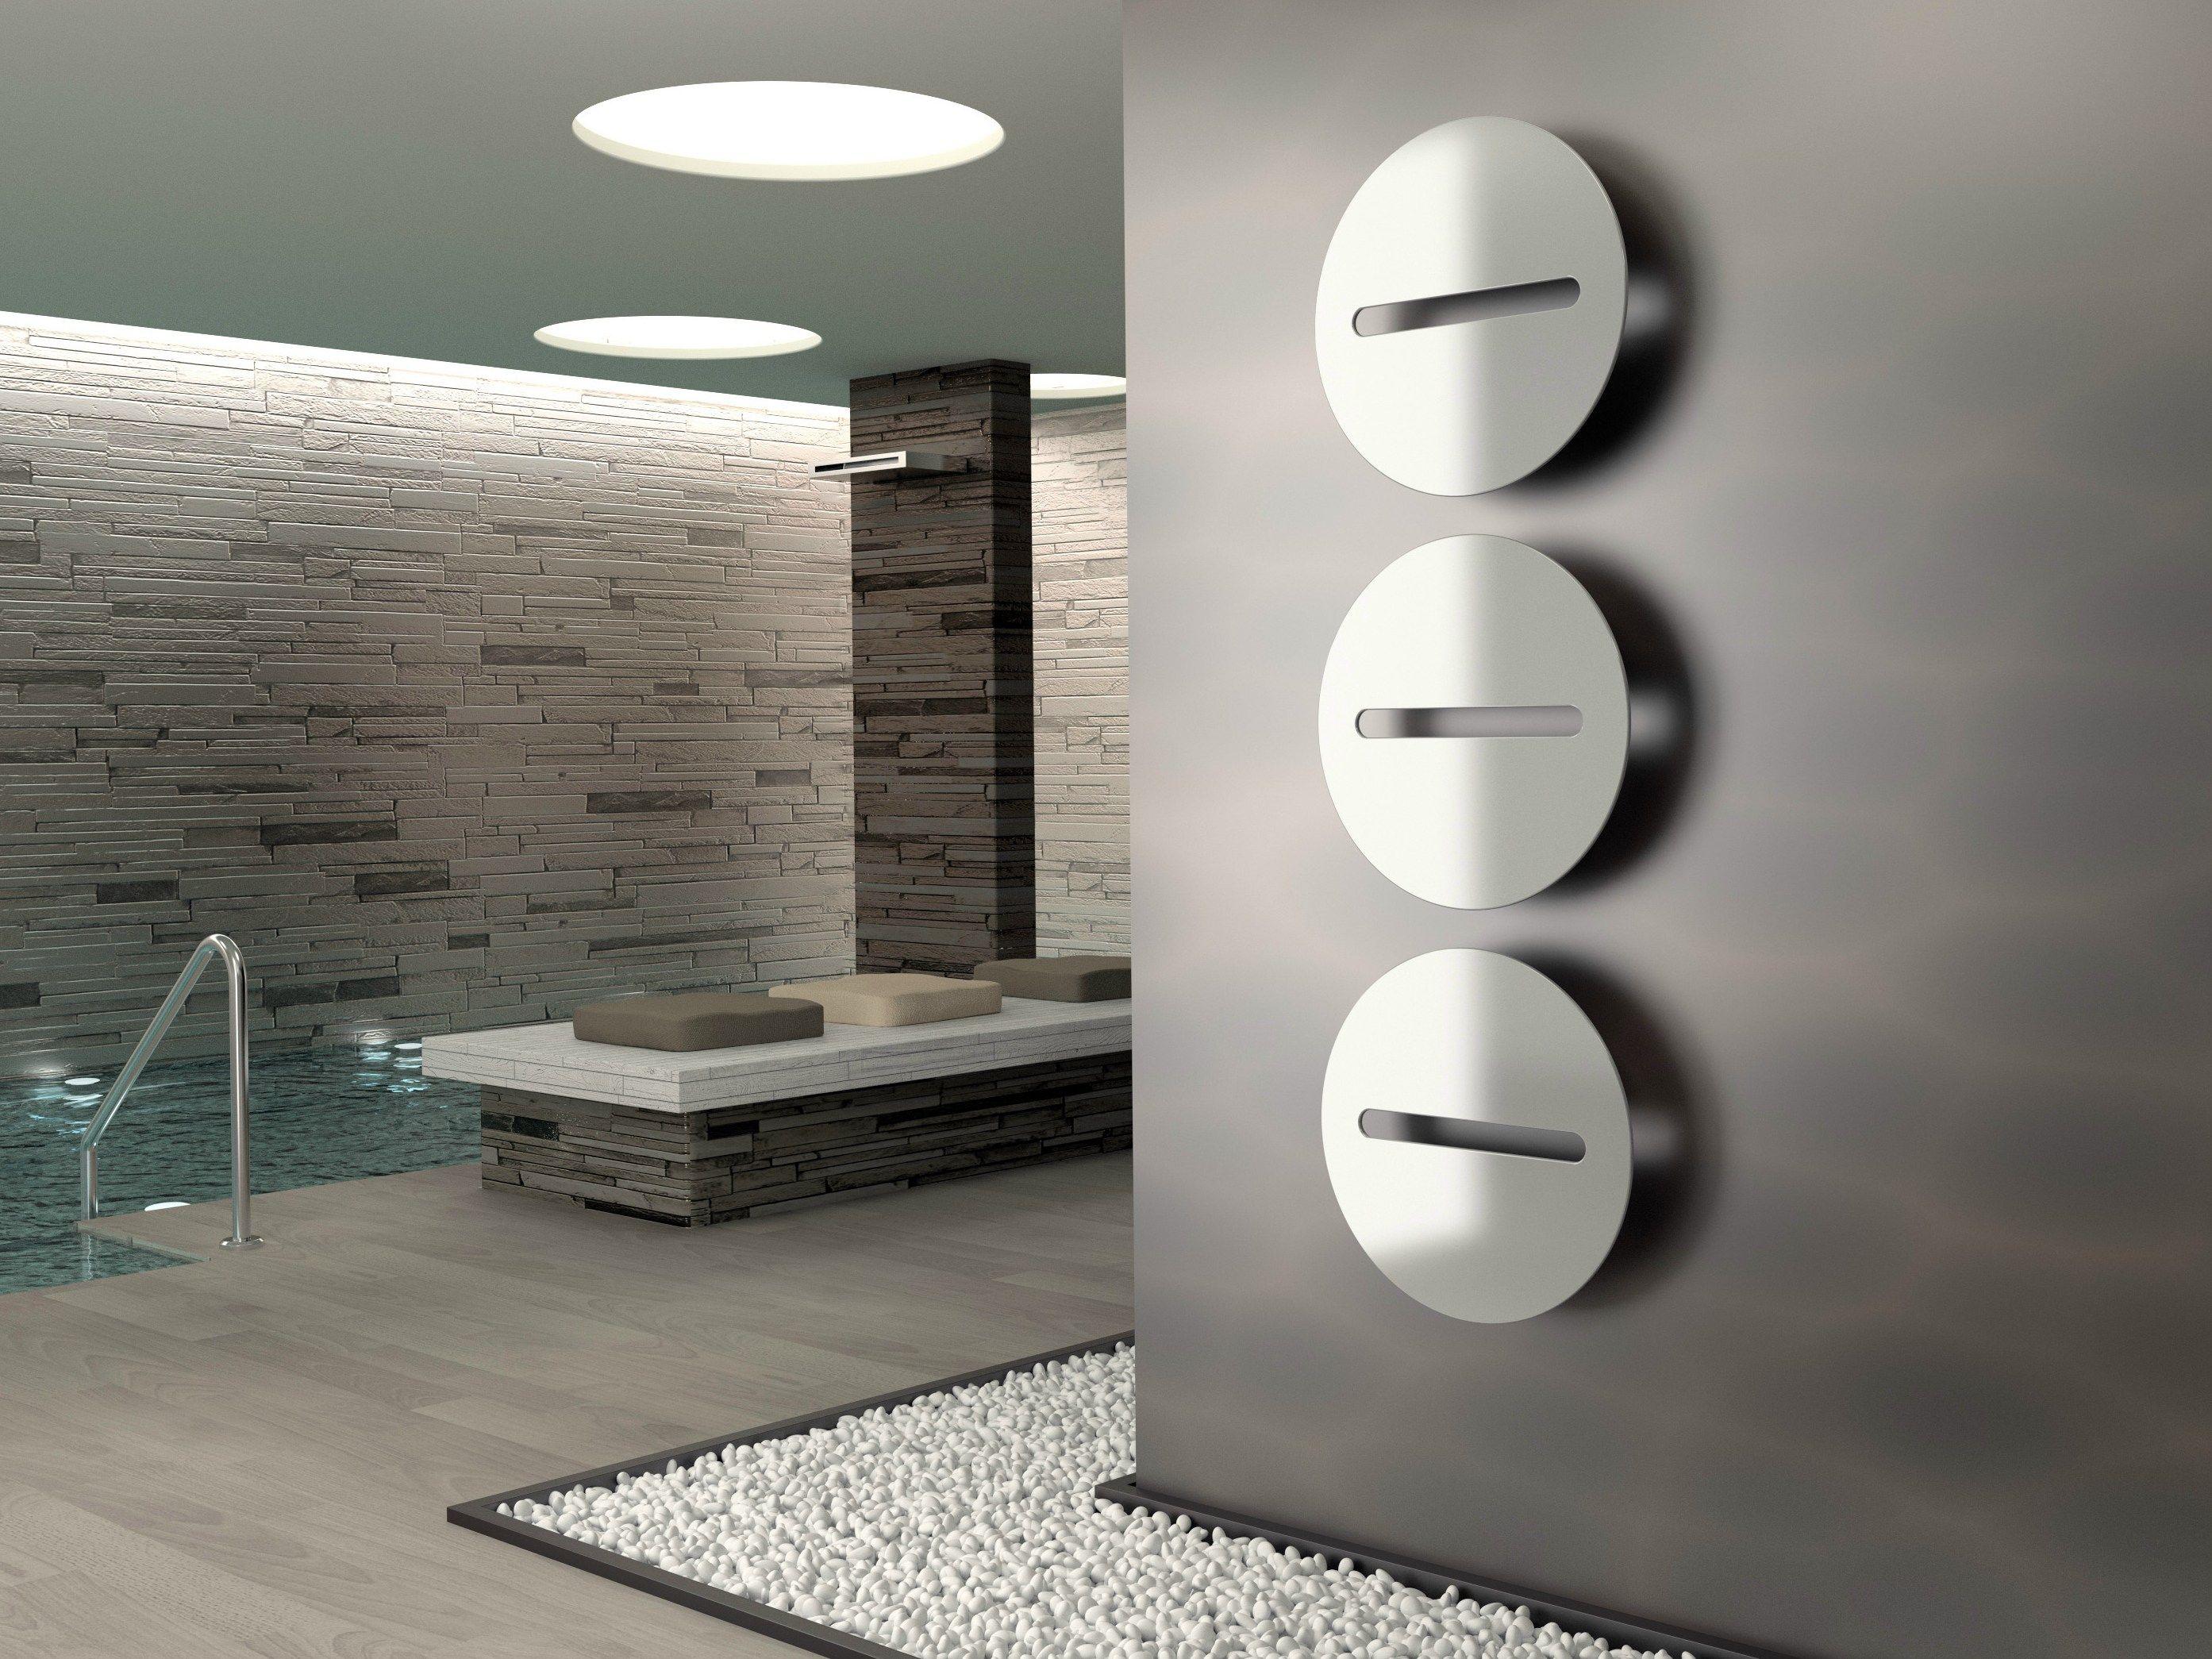 s che serviettes eau chaude modulable mural sfere by. Black Bedroom Furniture Sets. Home Design Ideas